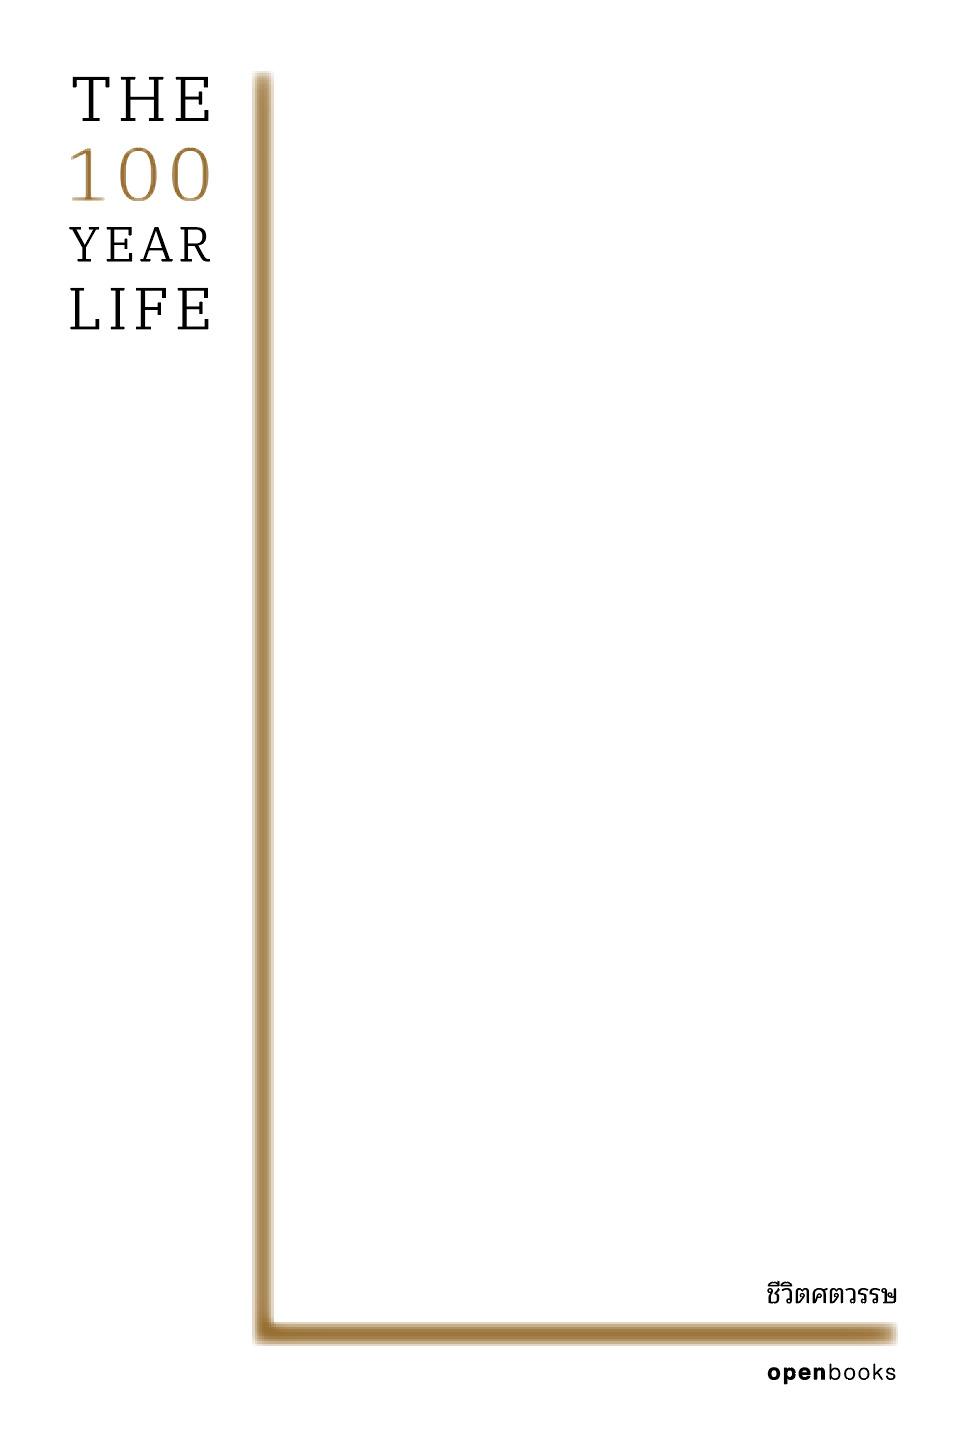 THE 100-YEAR LIFE - ชีวิตศตวรรษ